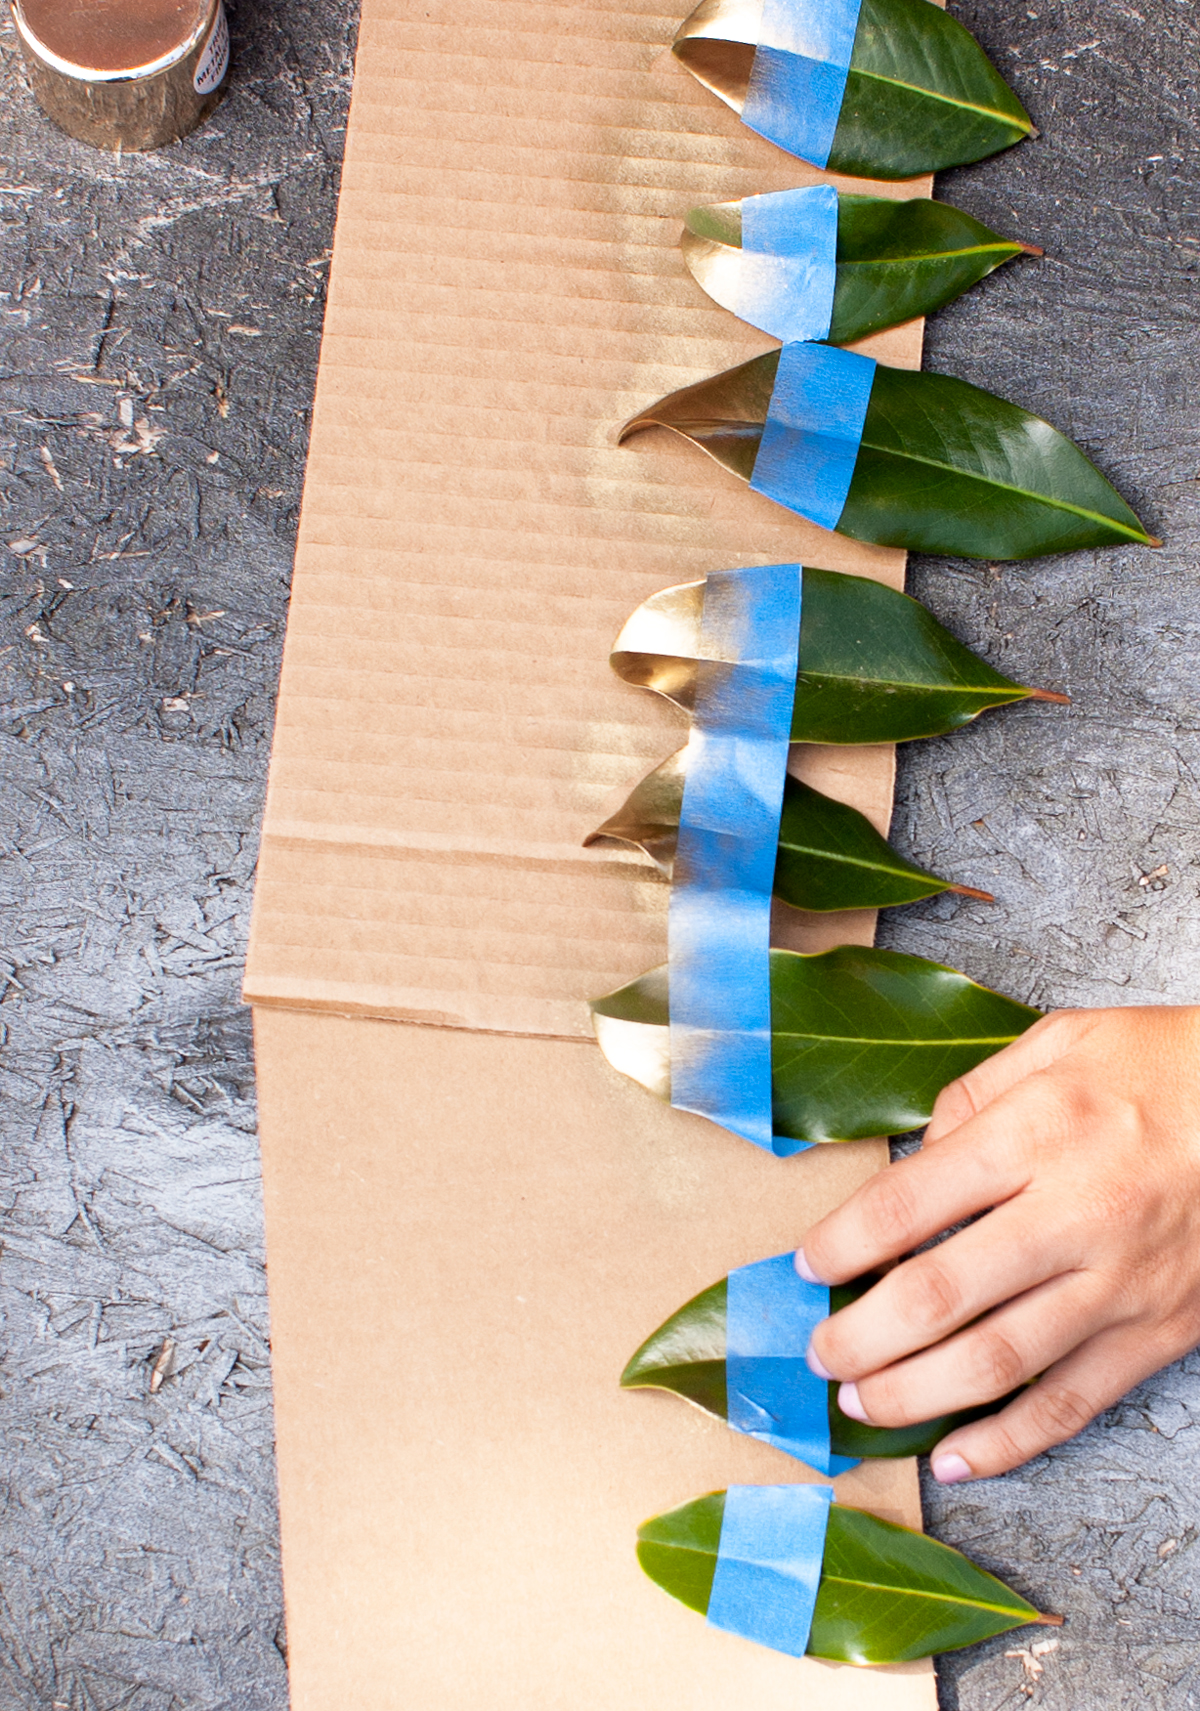 magnolia-spray-paint-caligraphy-spray-painting-(1-of-1).jpg